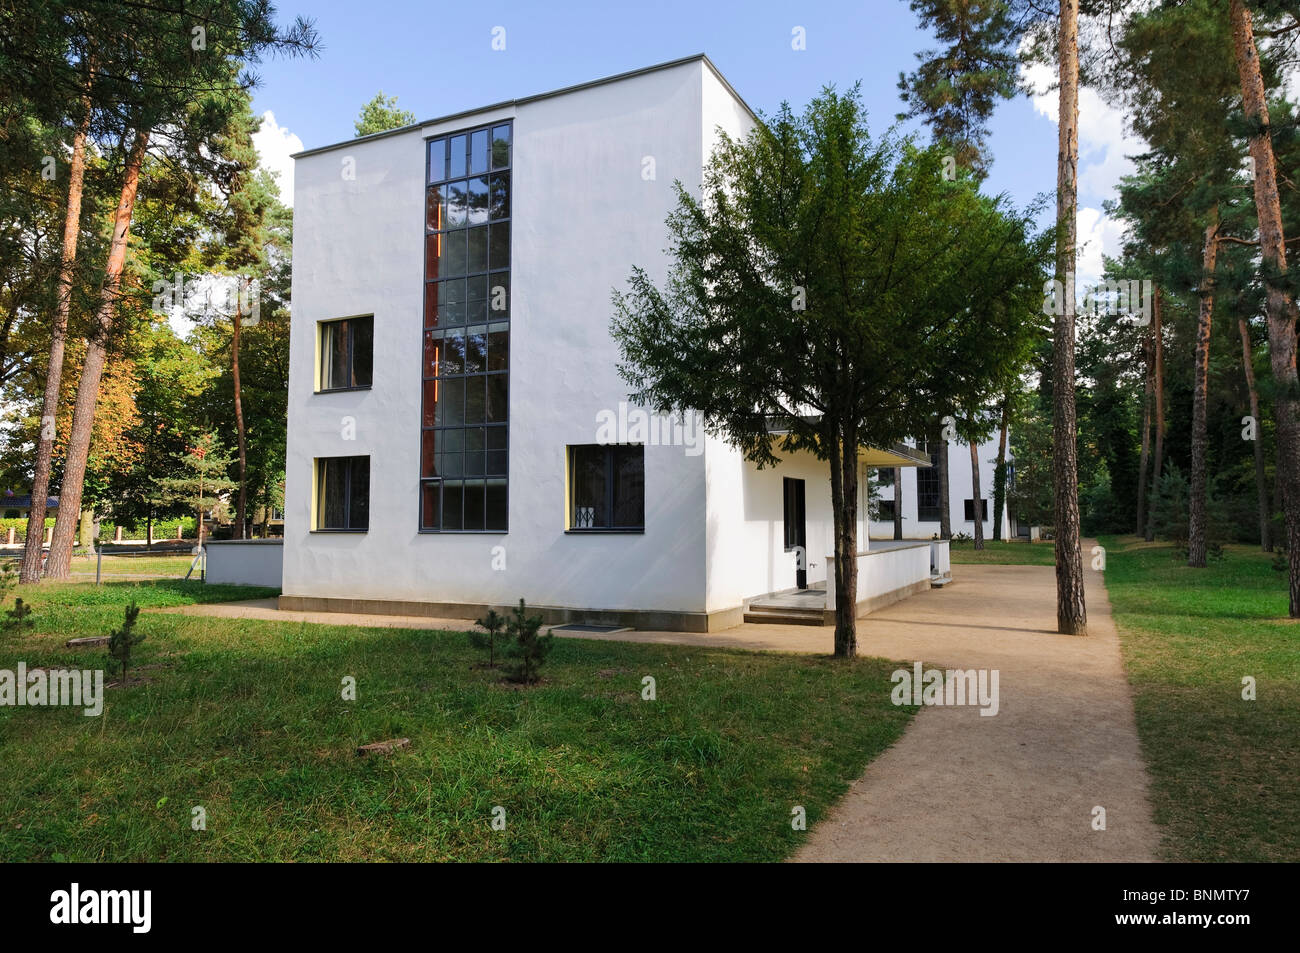 Bauhaus Re Use Building Stockfotos & Bauhaus Re Use Building Bilder ...